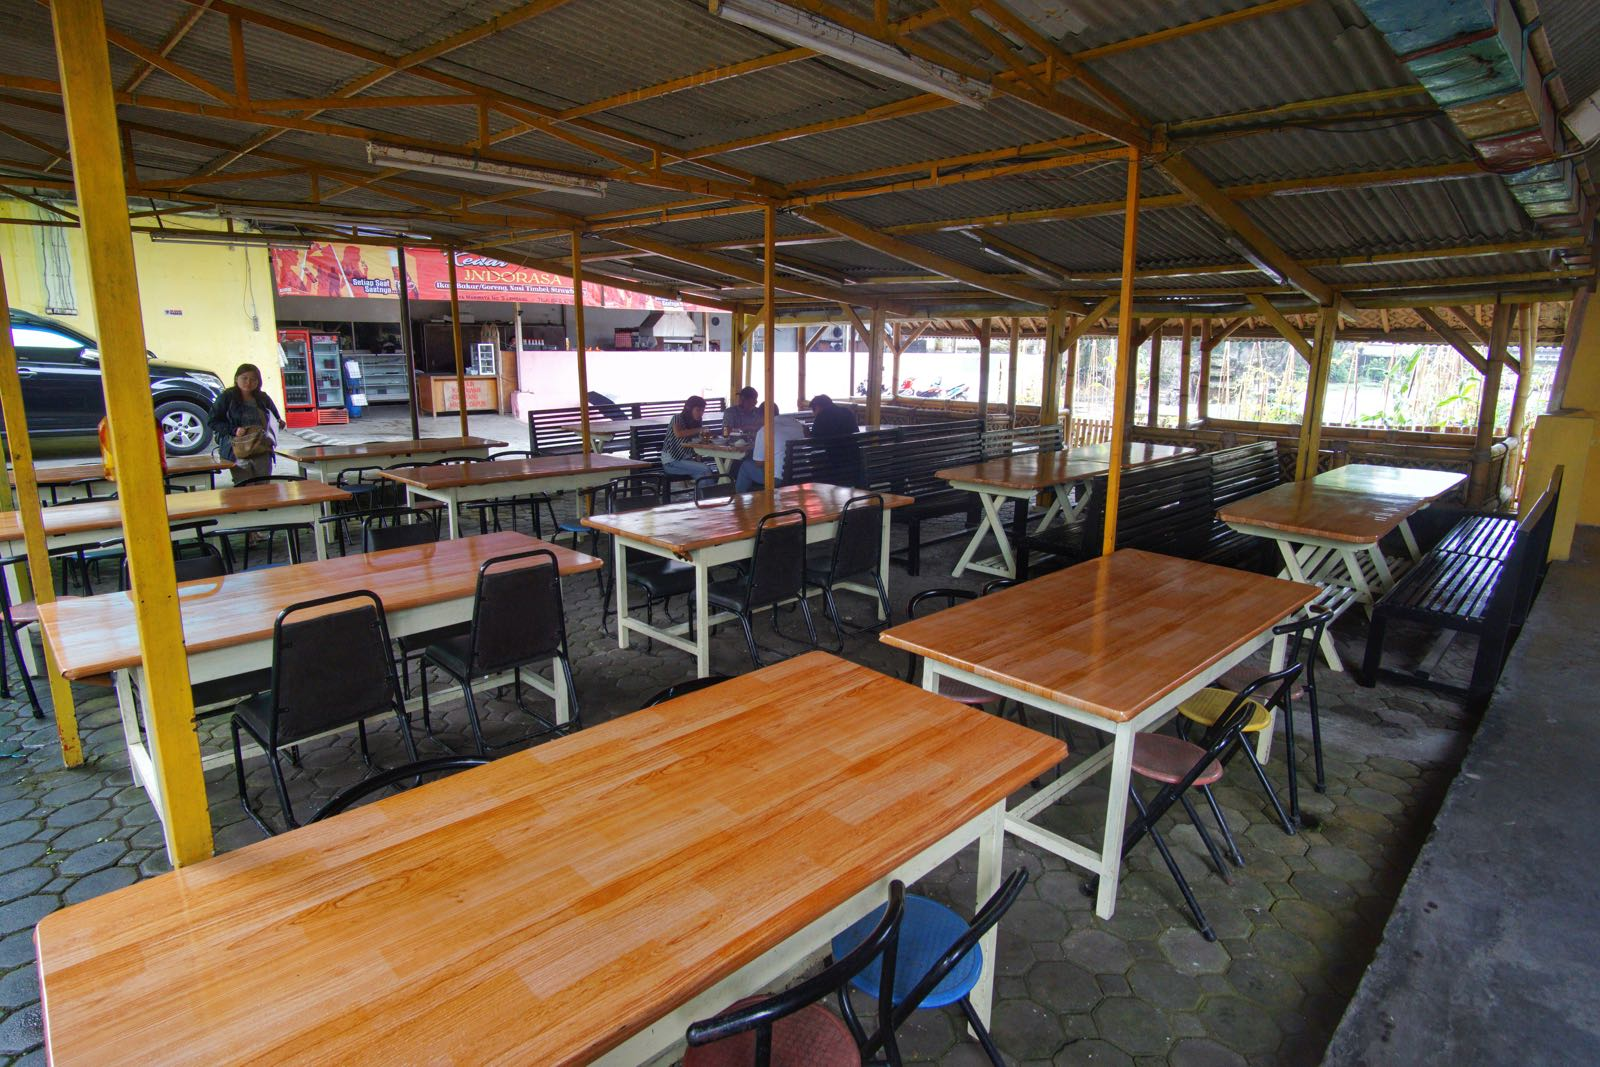 Area Makan Kedai Teteh Indorasa